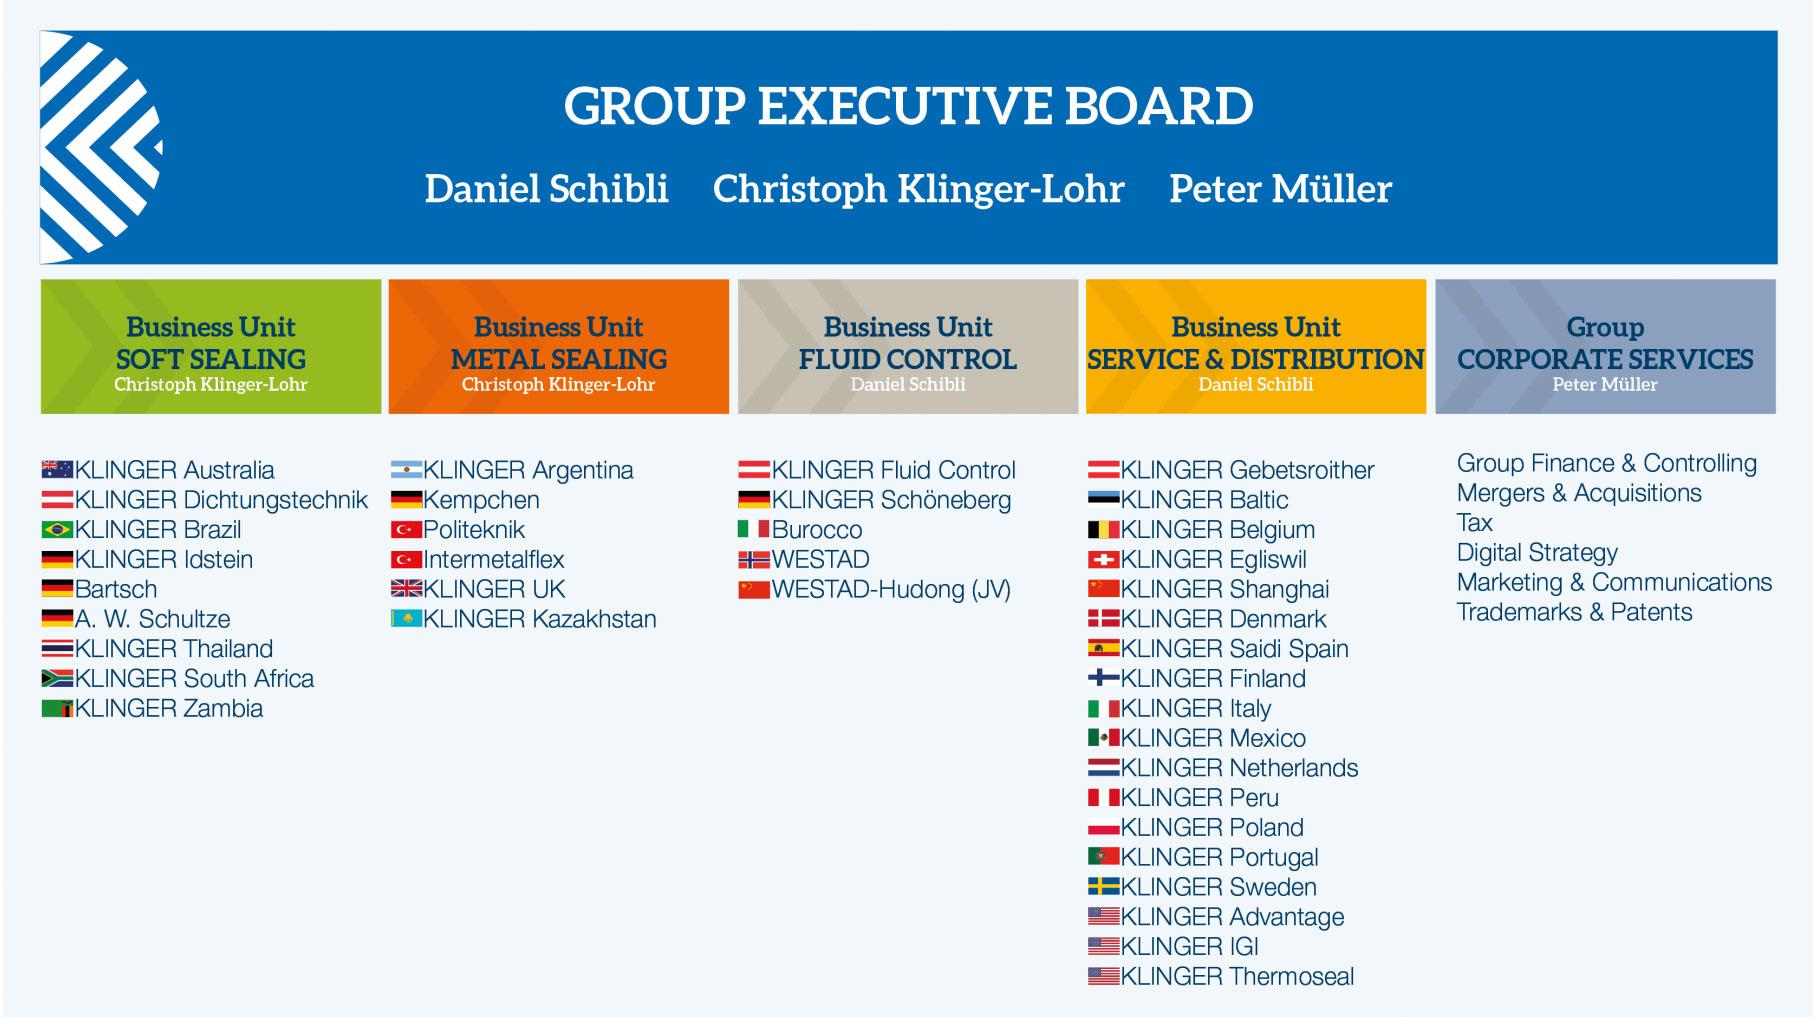 Klinger Group Executive Board